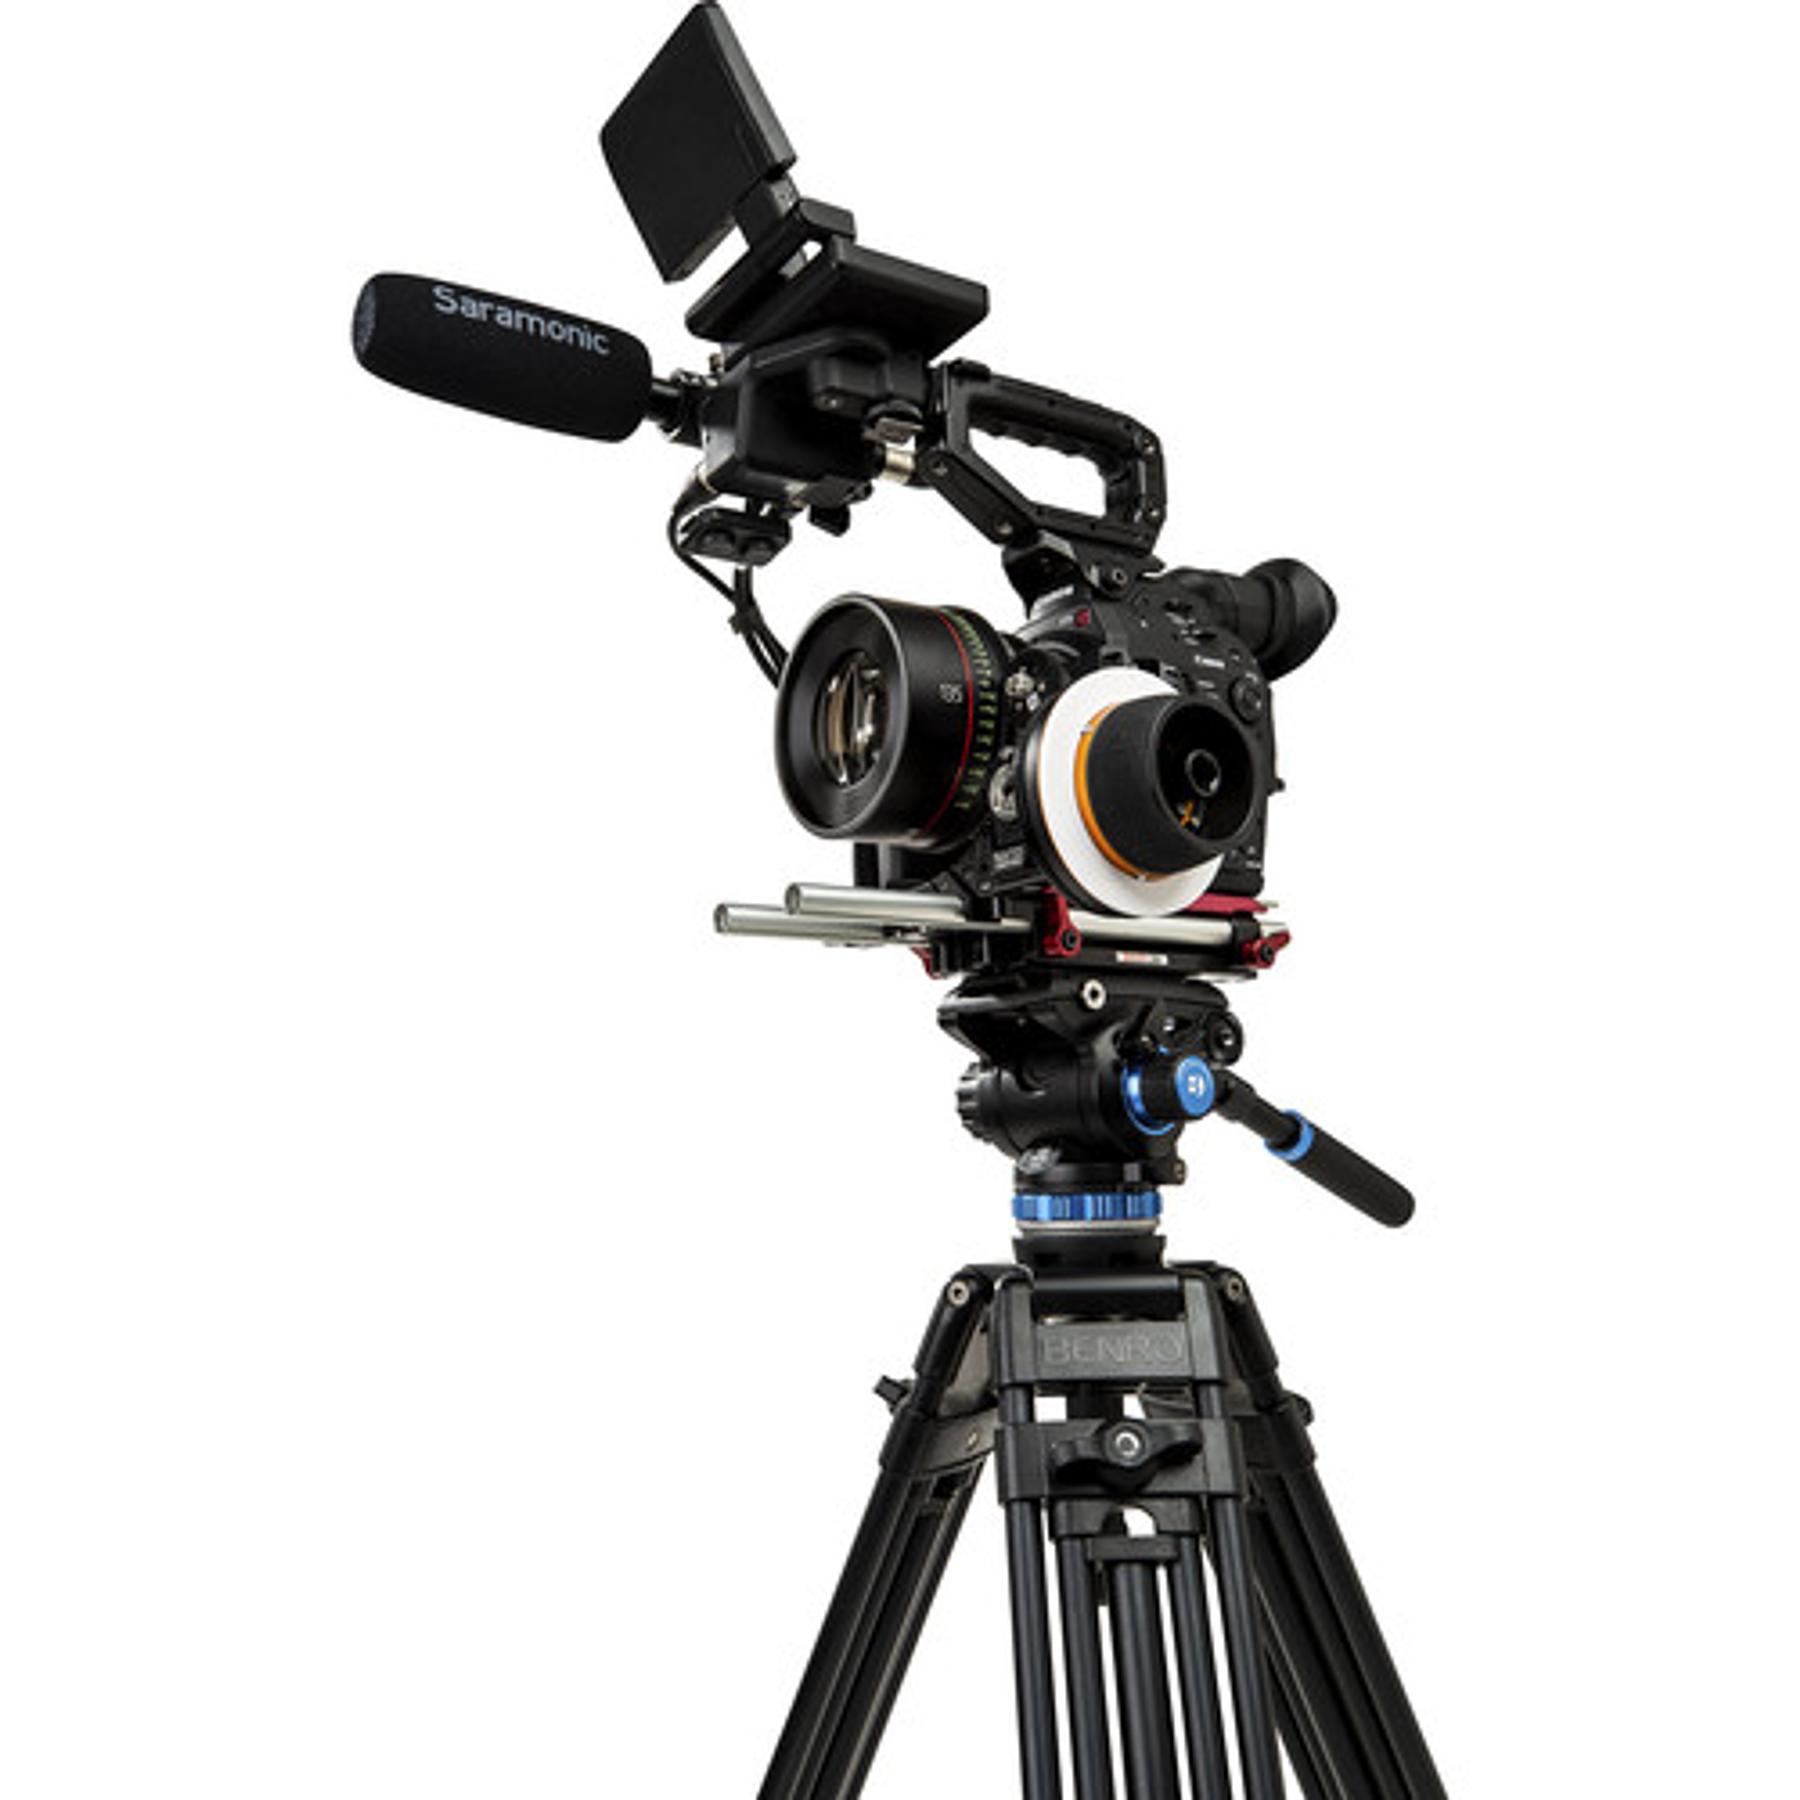 Cabezal de video fluido Benro S6Pro